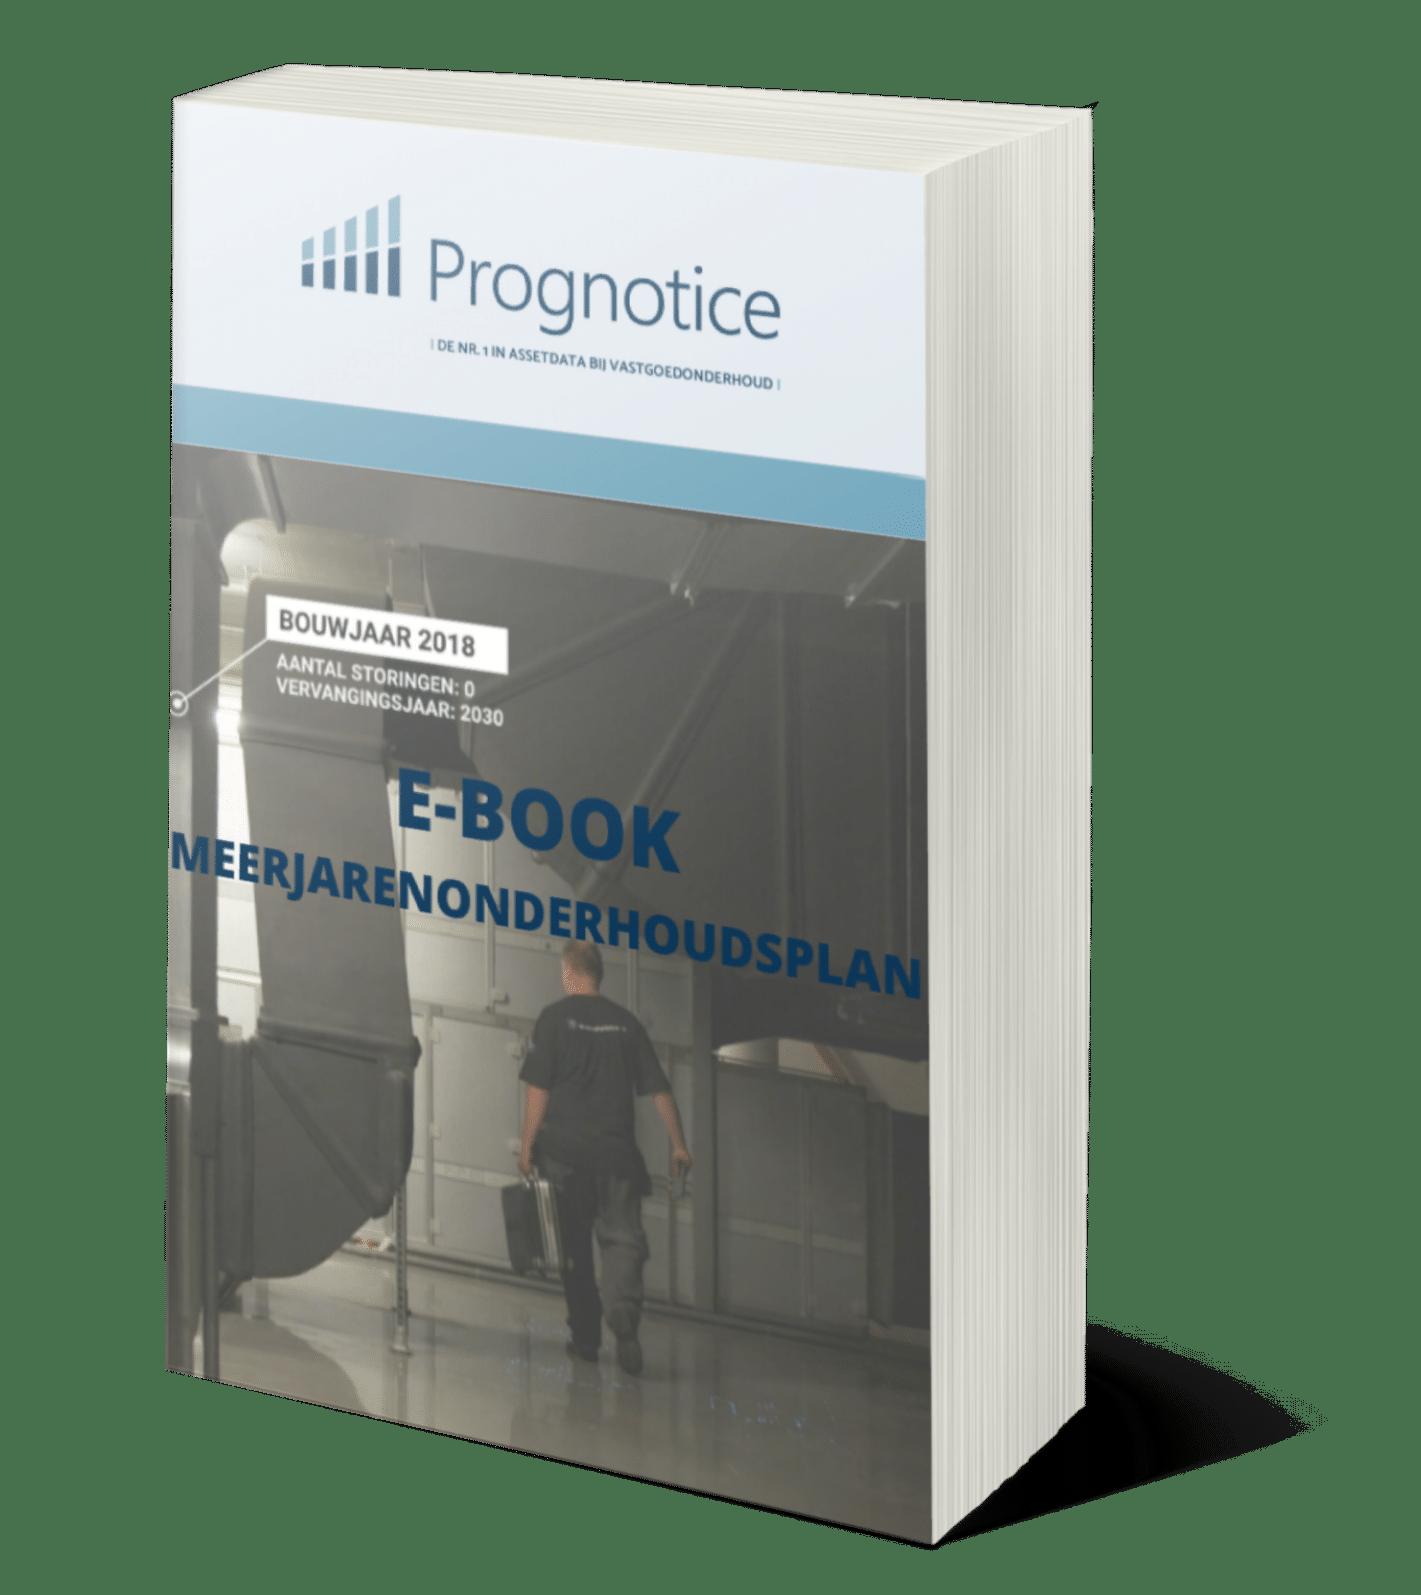 Meerjarenonderhoudsplan e-book